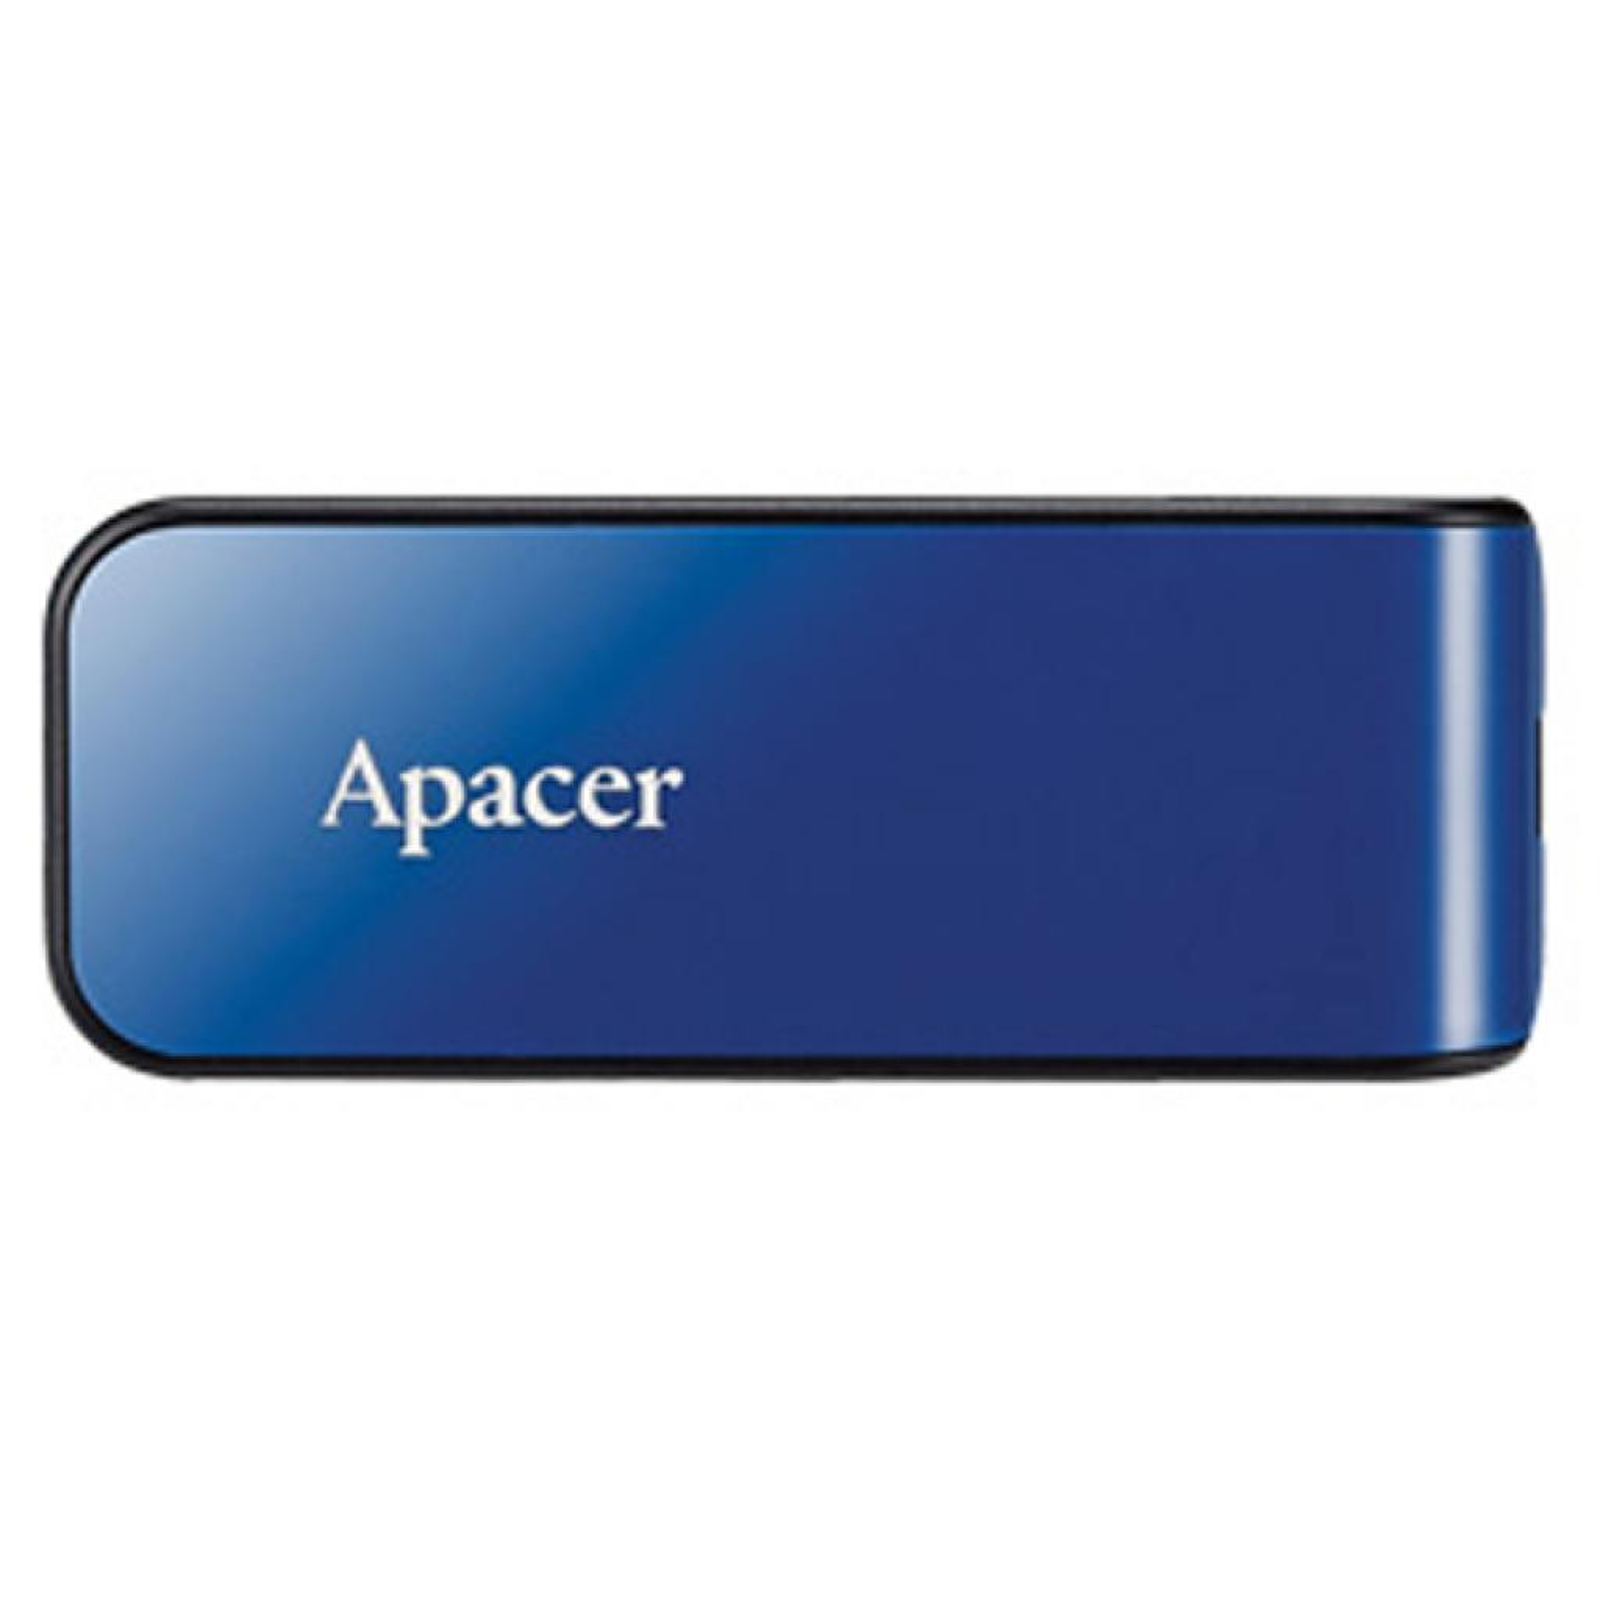 USB флеш накопитель Apacer 64GB AH334 blue USB 2.0 (AP64GAH334U-1)